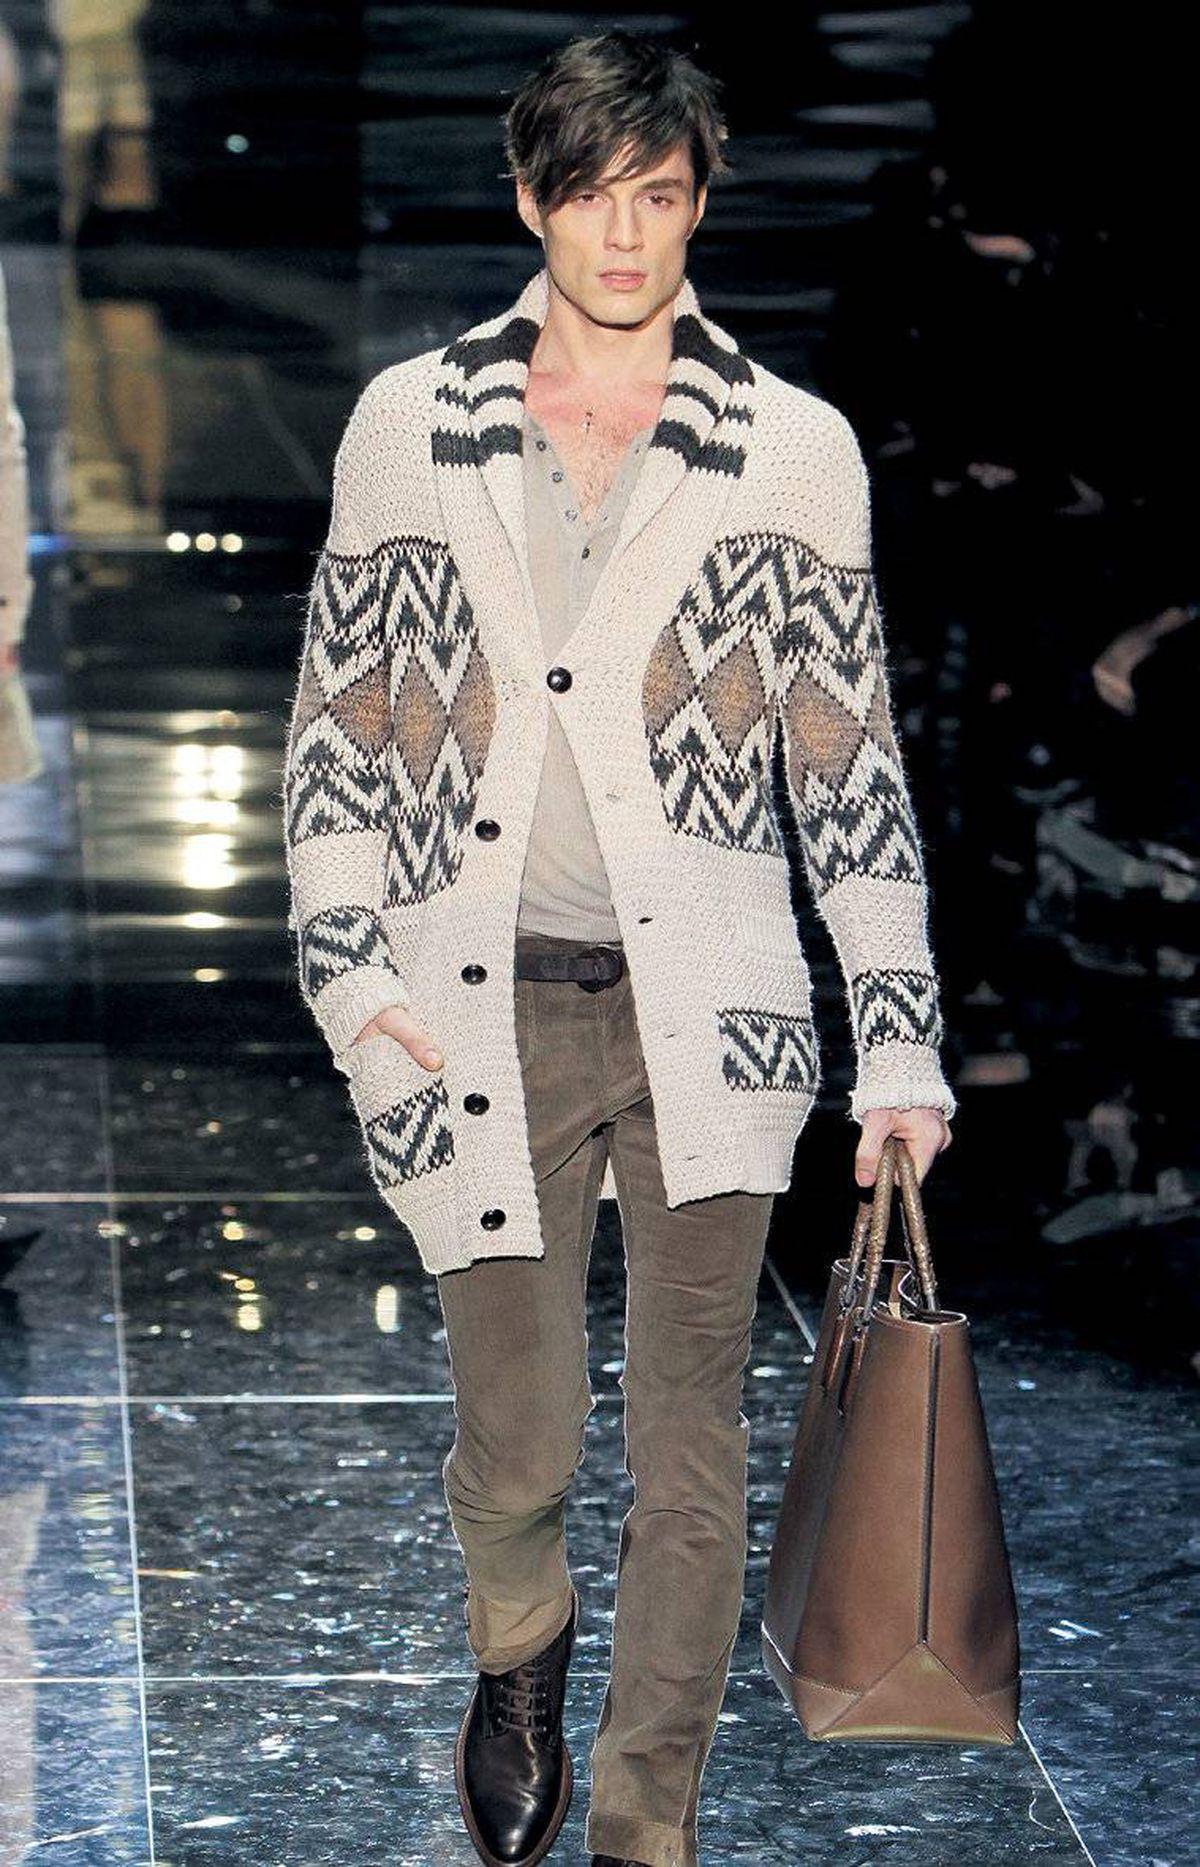 Shawl-collar cardigan on the runway